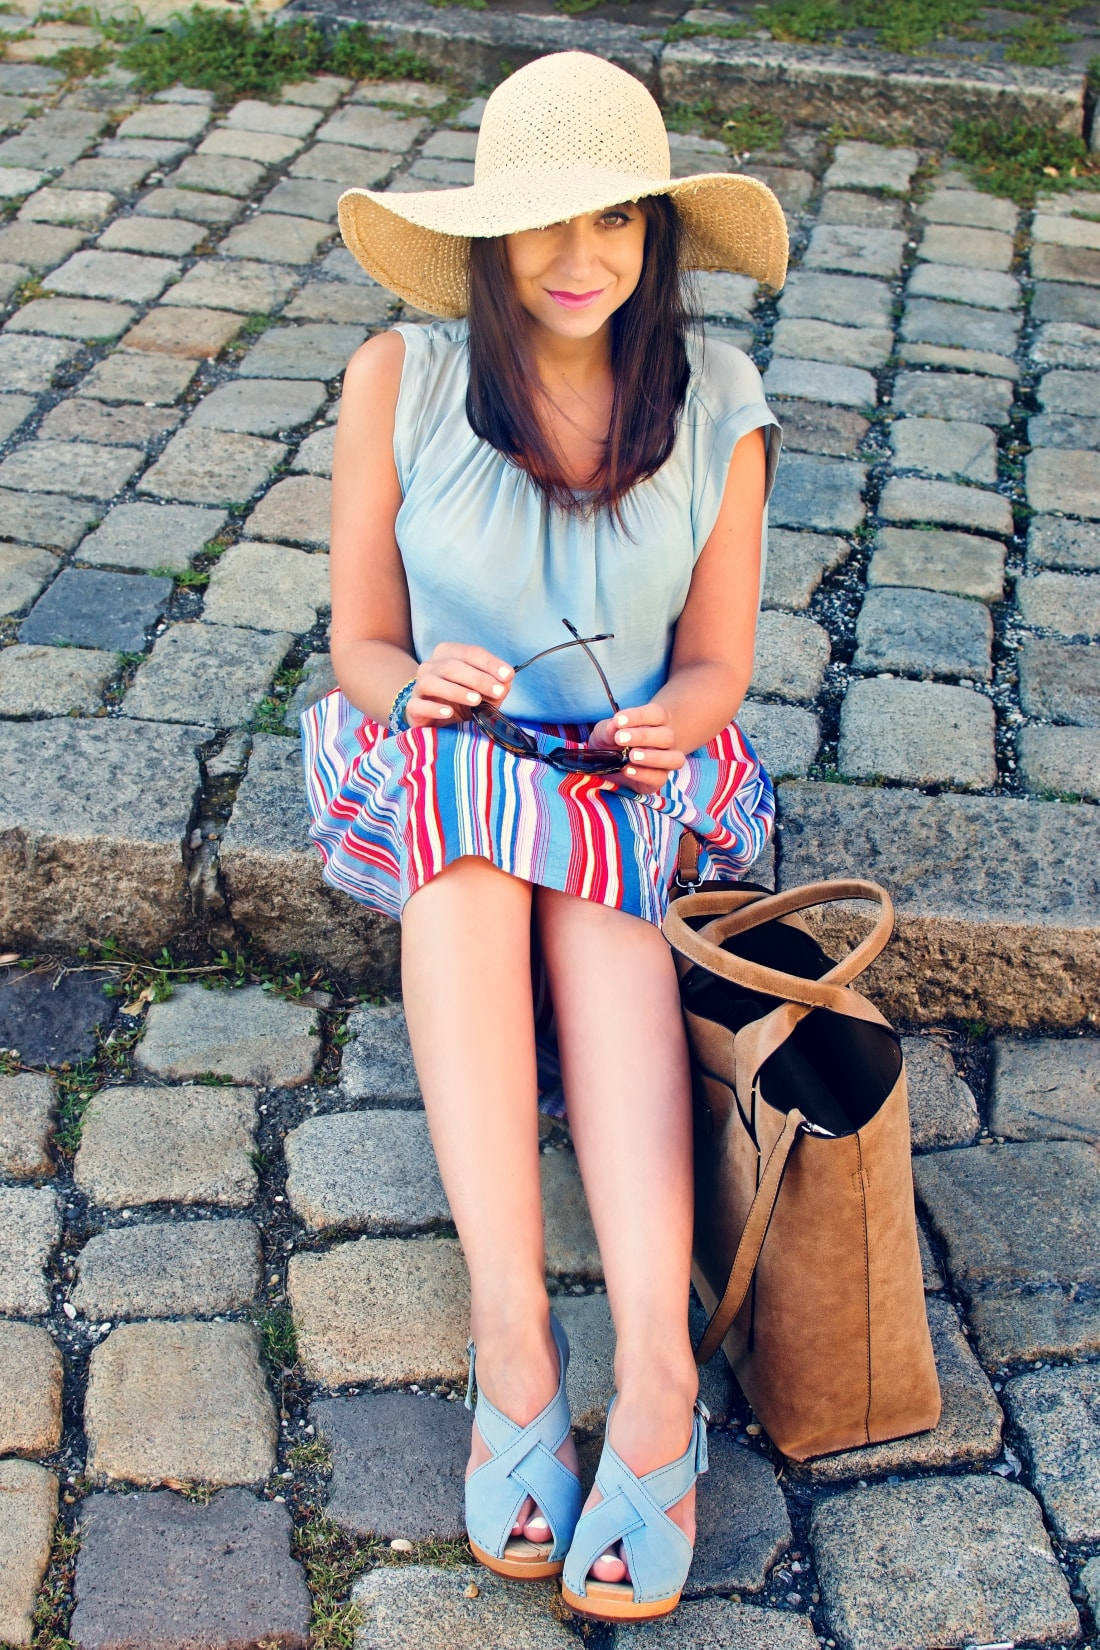 Handmade clogs_Katharine-fashion is beautiful blog 8a_Sandgrens_Modré Dreváky_Prúžkovaná sukňa_Katarína Jakubčová_Fashion blogger